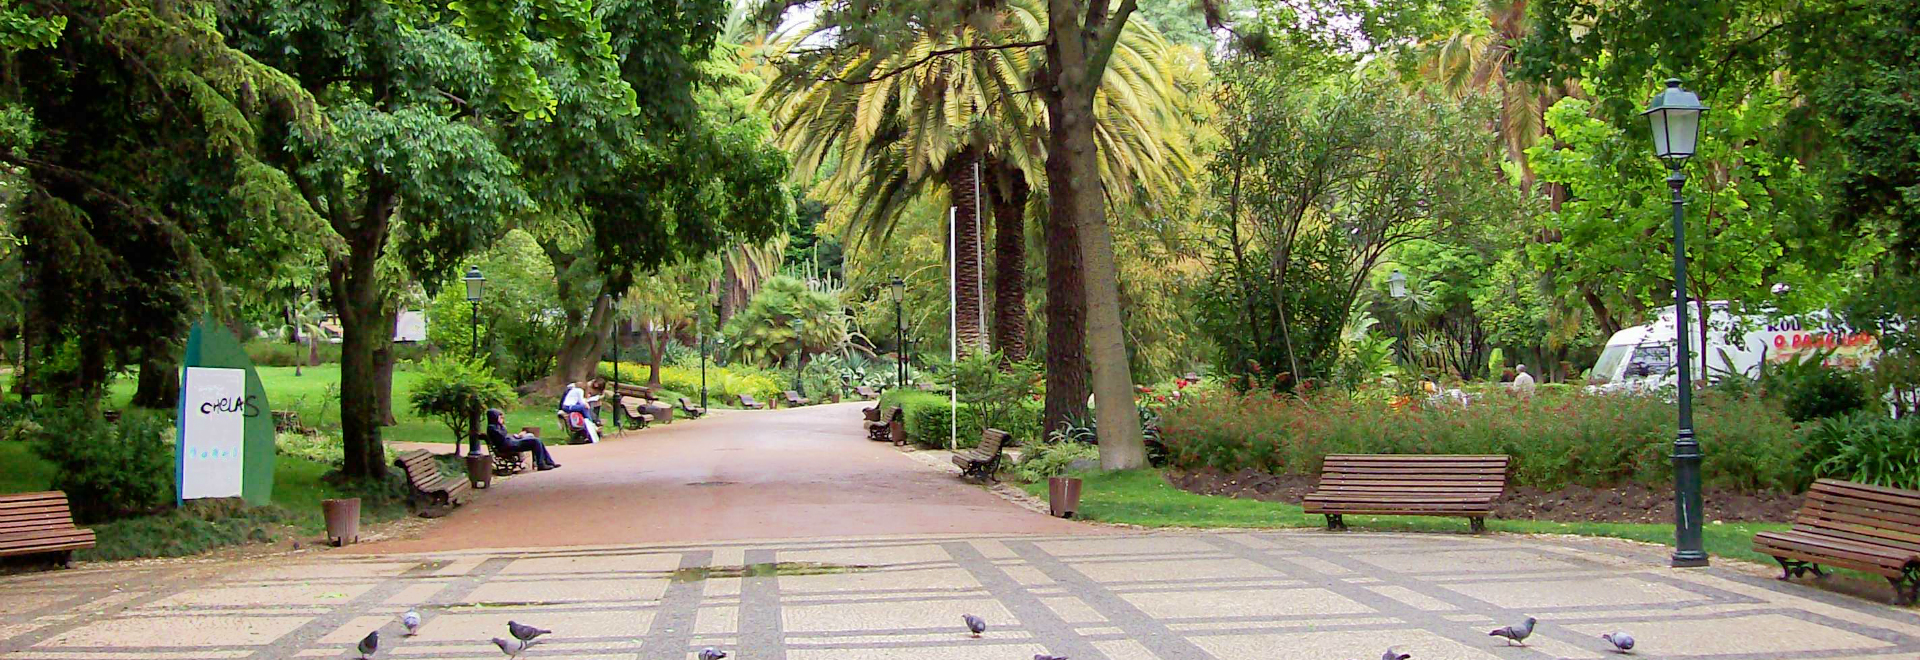 Artesanato Em Couro ~ Jardim da Estrelaà Lisbonne a des lacs